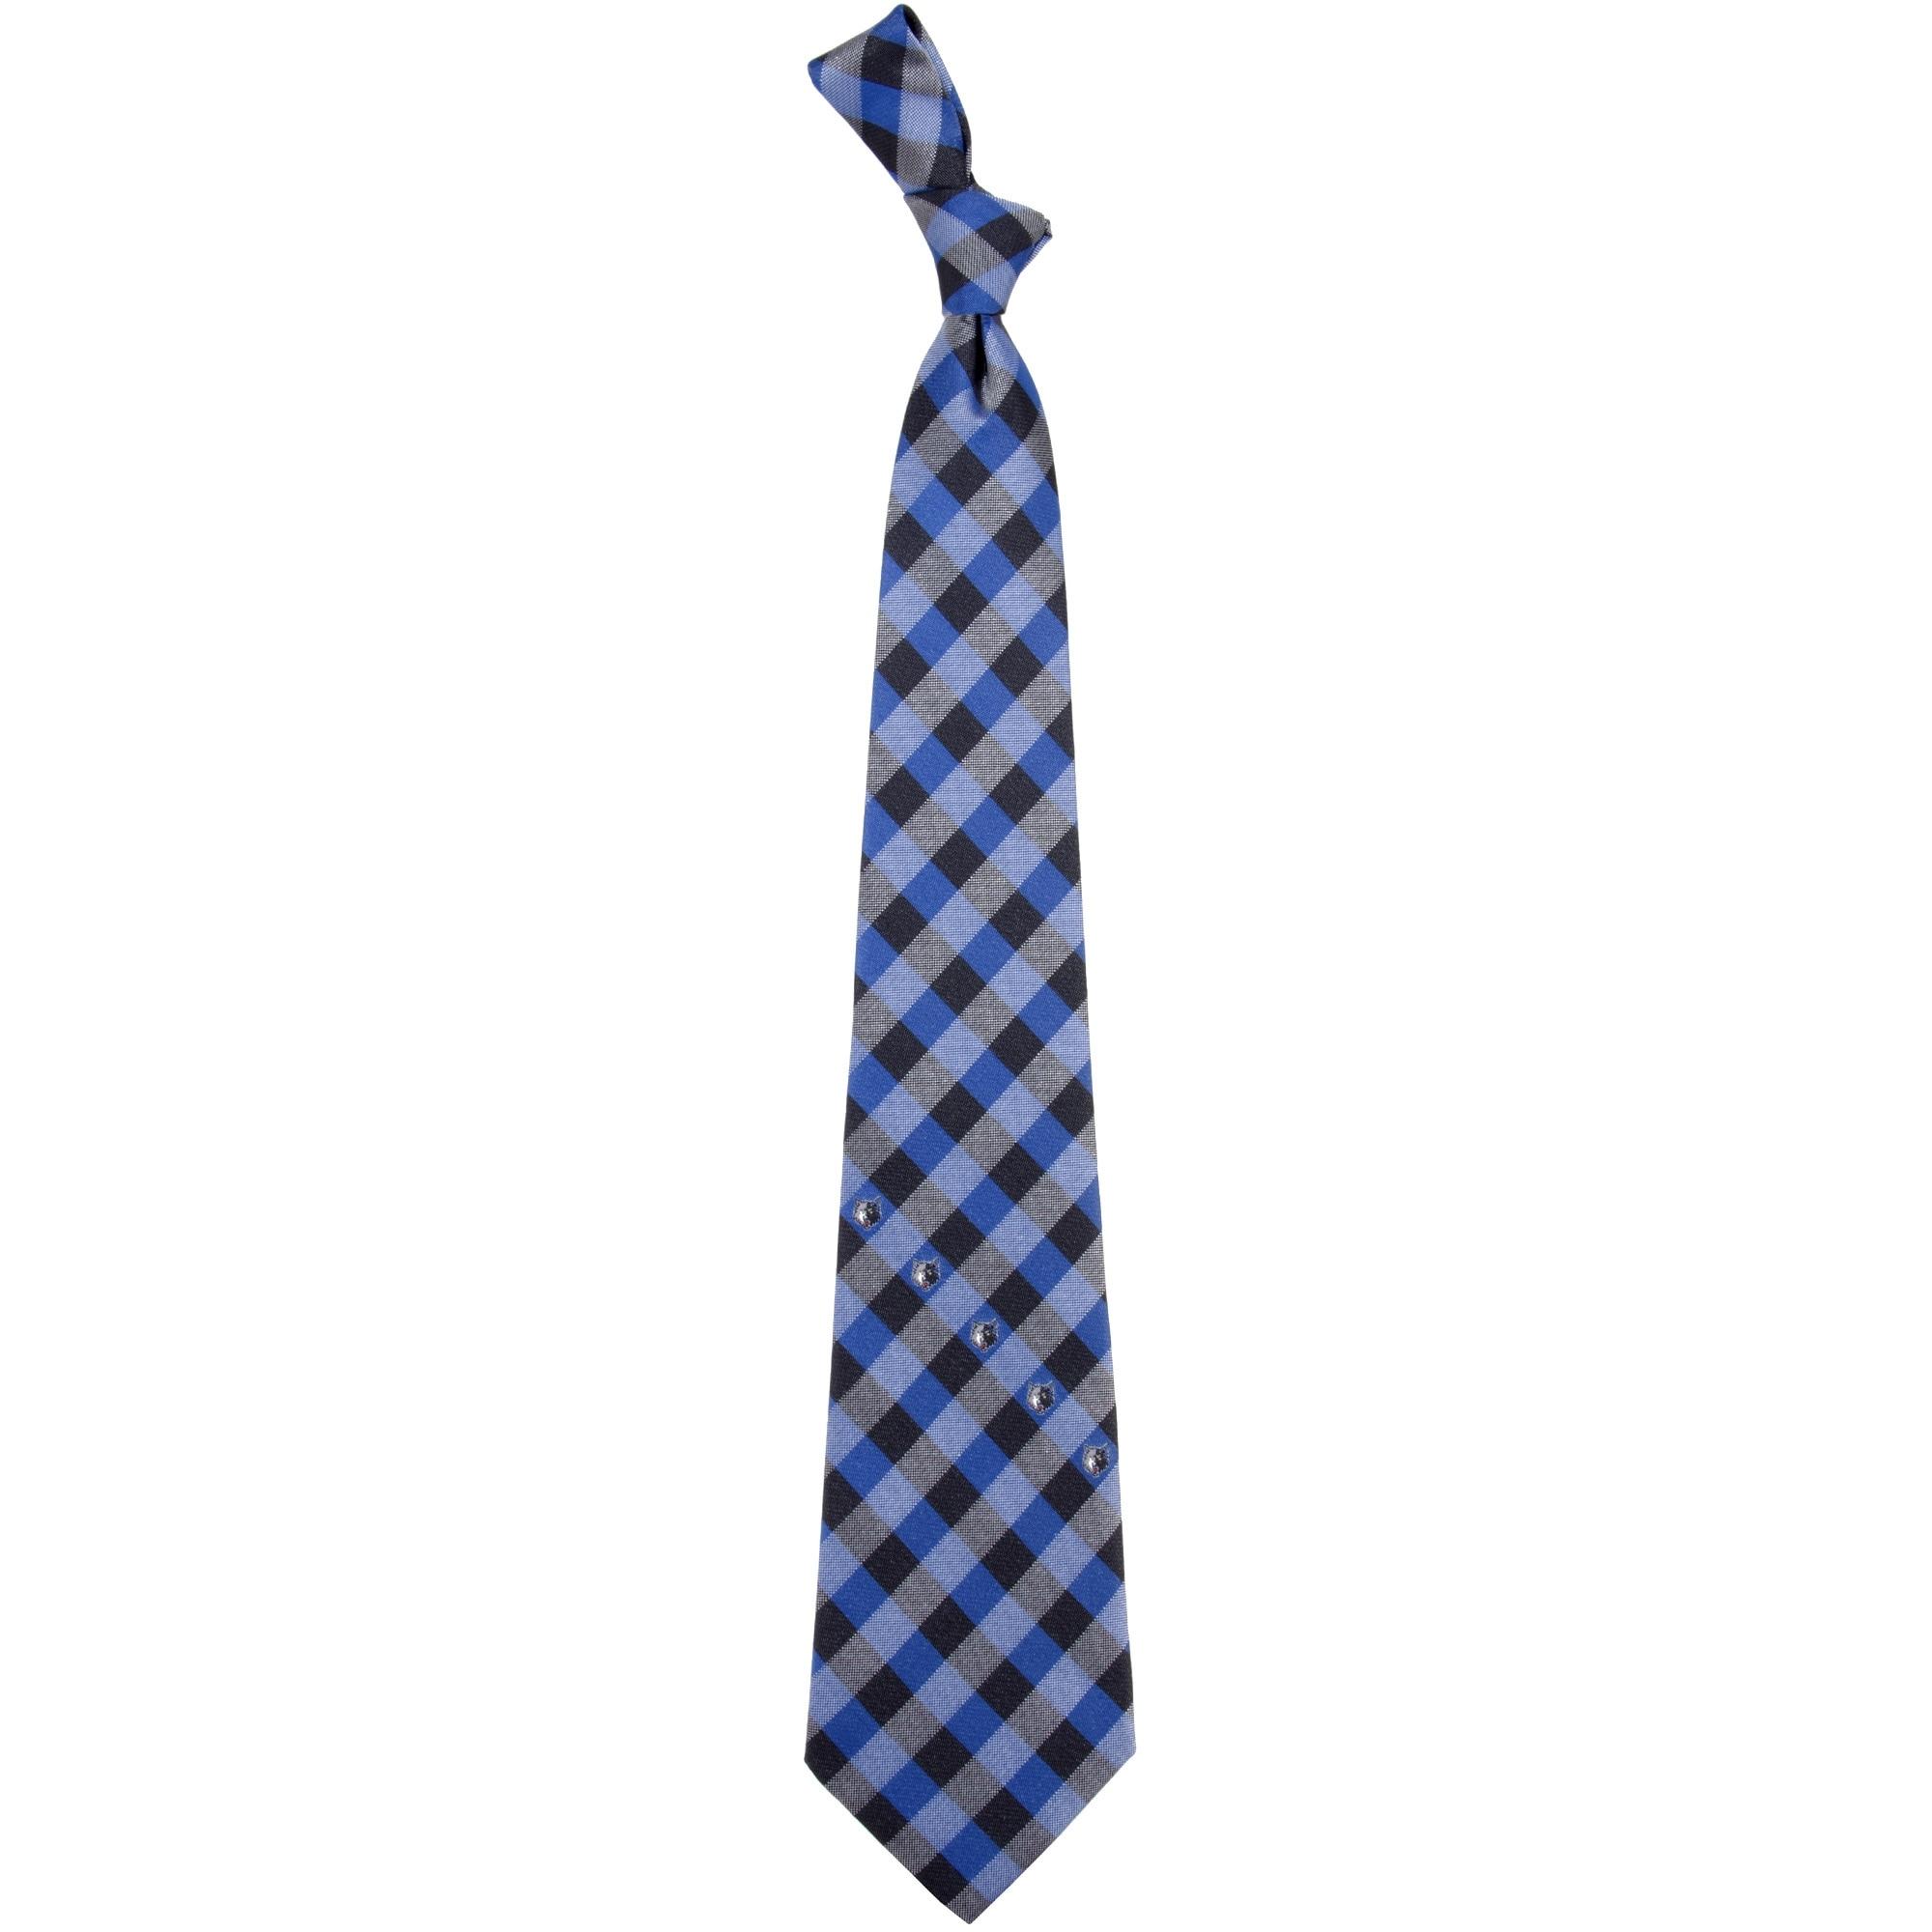 Minnesota Timberwolves Woven Checkered Tie - Royal Blue/Navy Blue